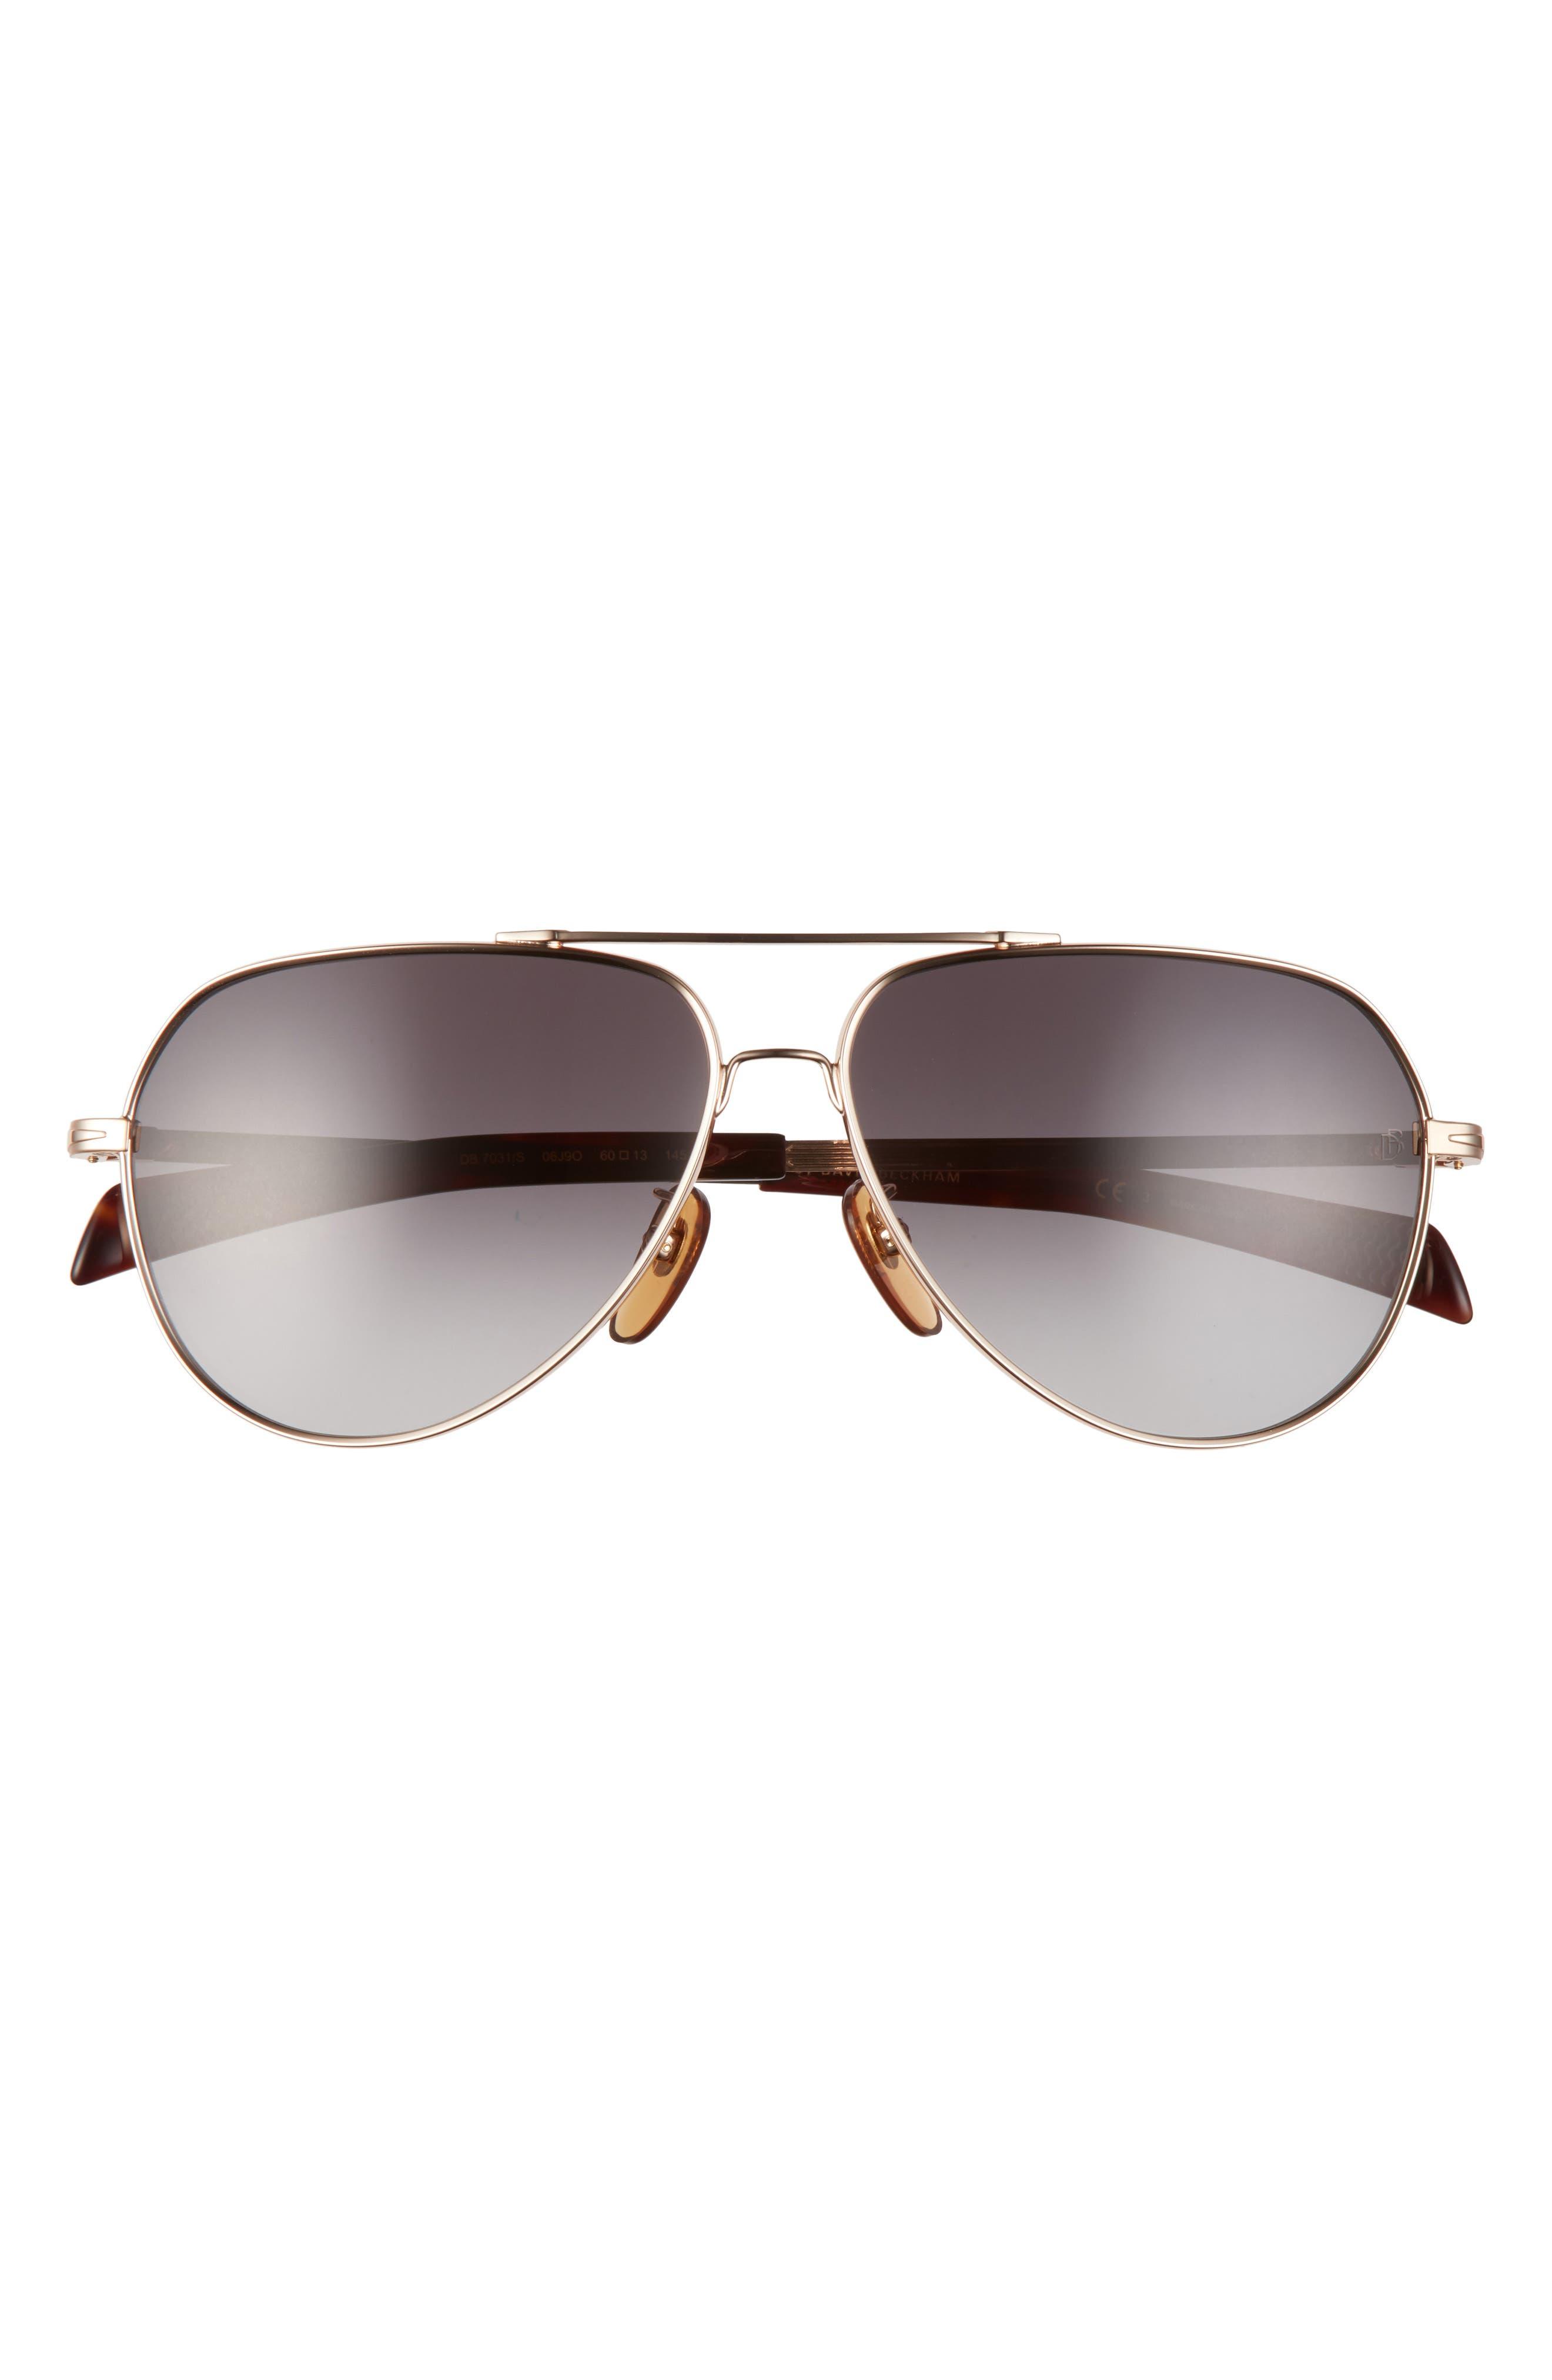 Men's Eyewear By David Beckham 60mm Gradient Aviator Sunglasses